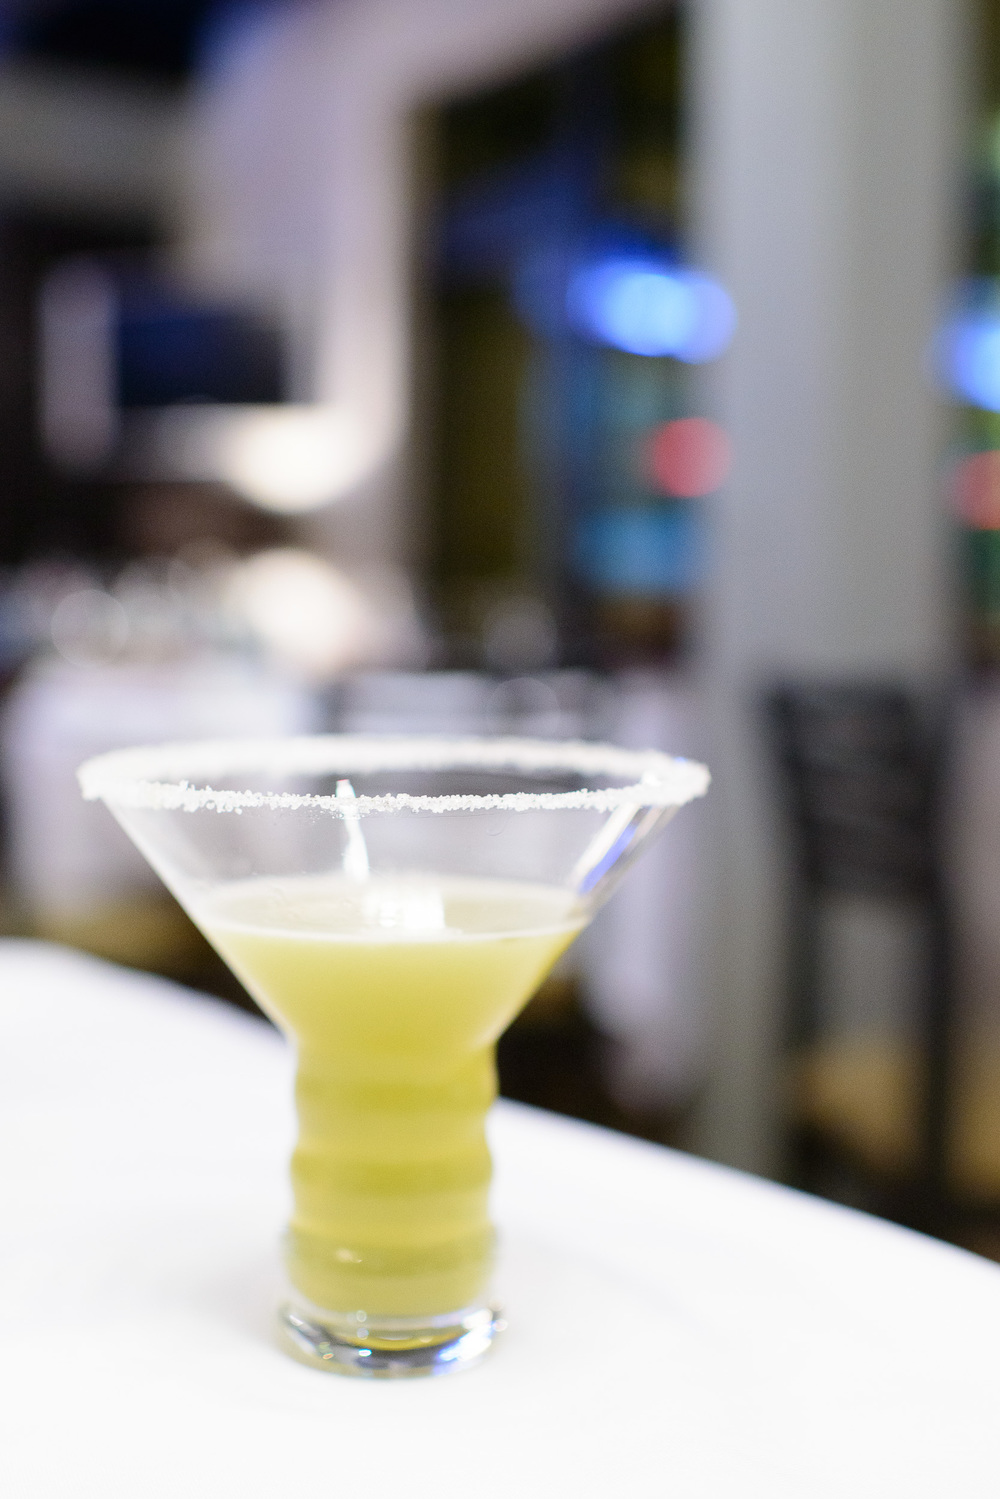 1st Course: Martini de garañona - licor típico de Metepec de m